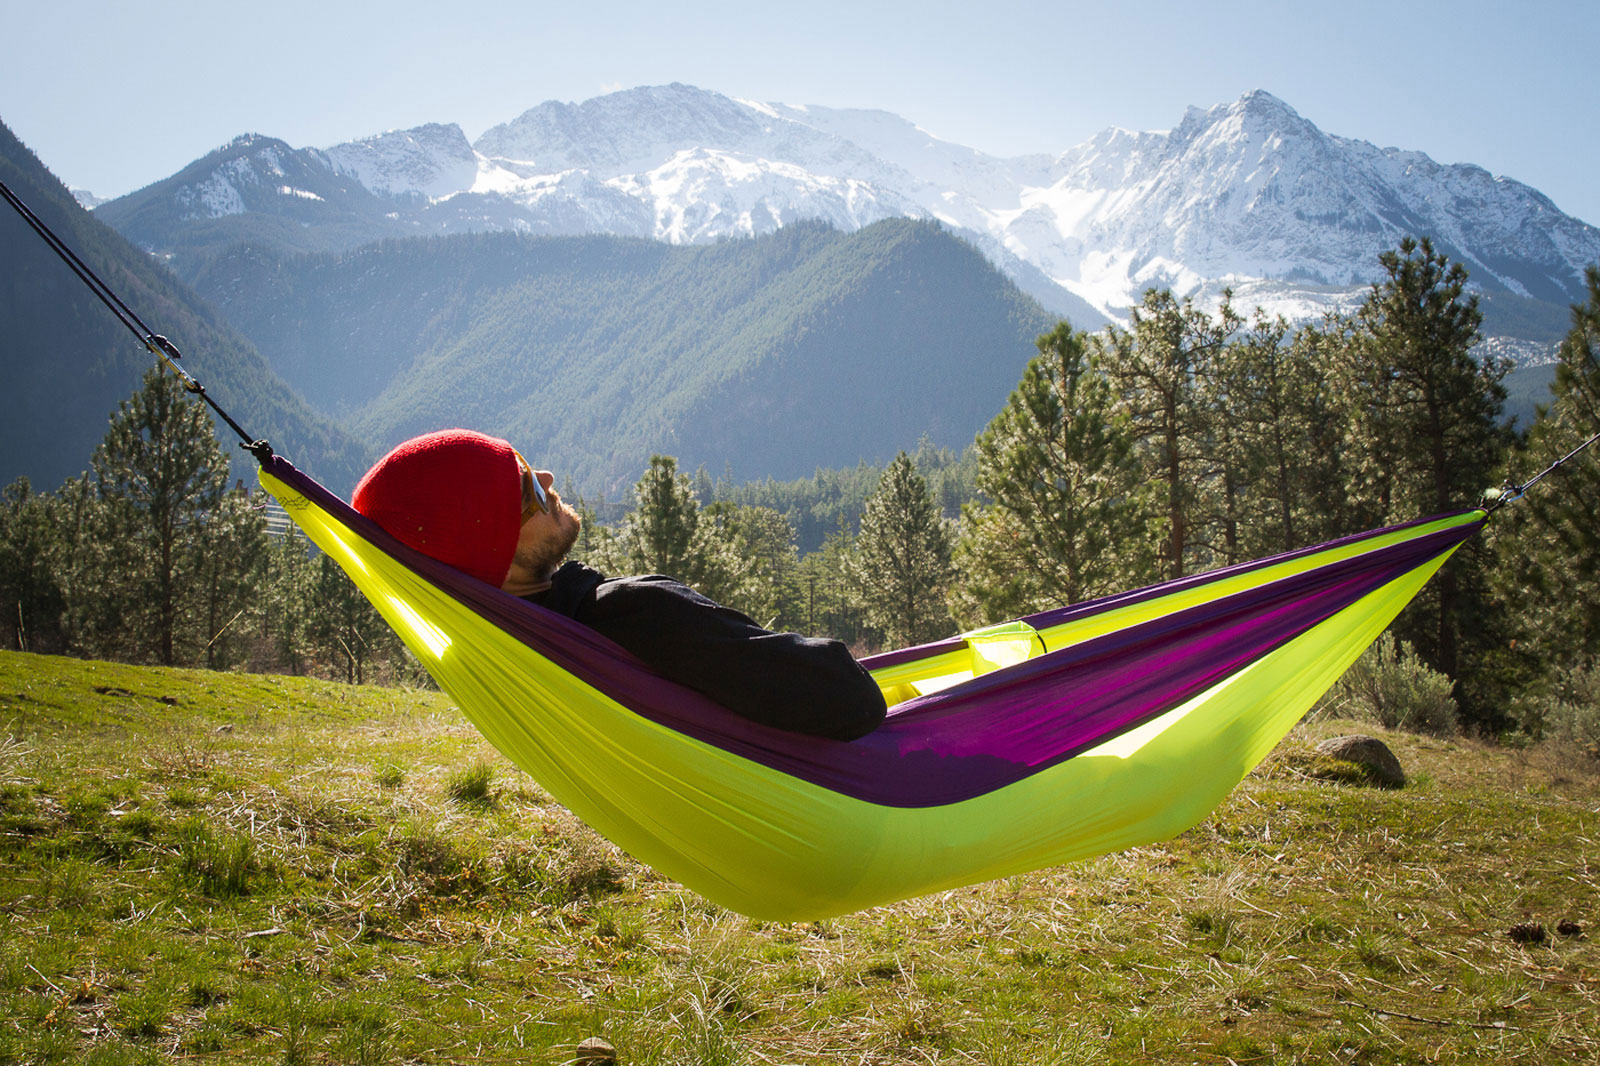 grand trunk single parachute nylon hammock outdoor camping  grand trunk single parachute nylon hammock outdoor camping travel      rh   ebay